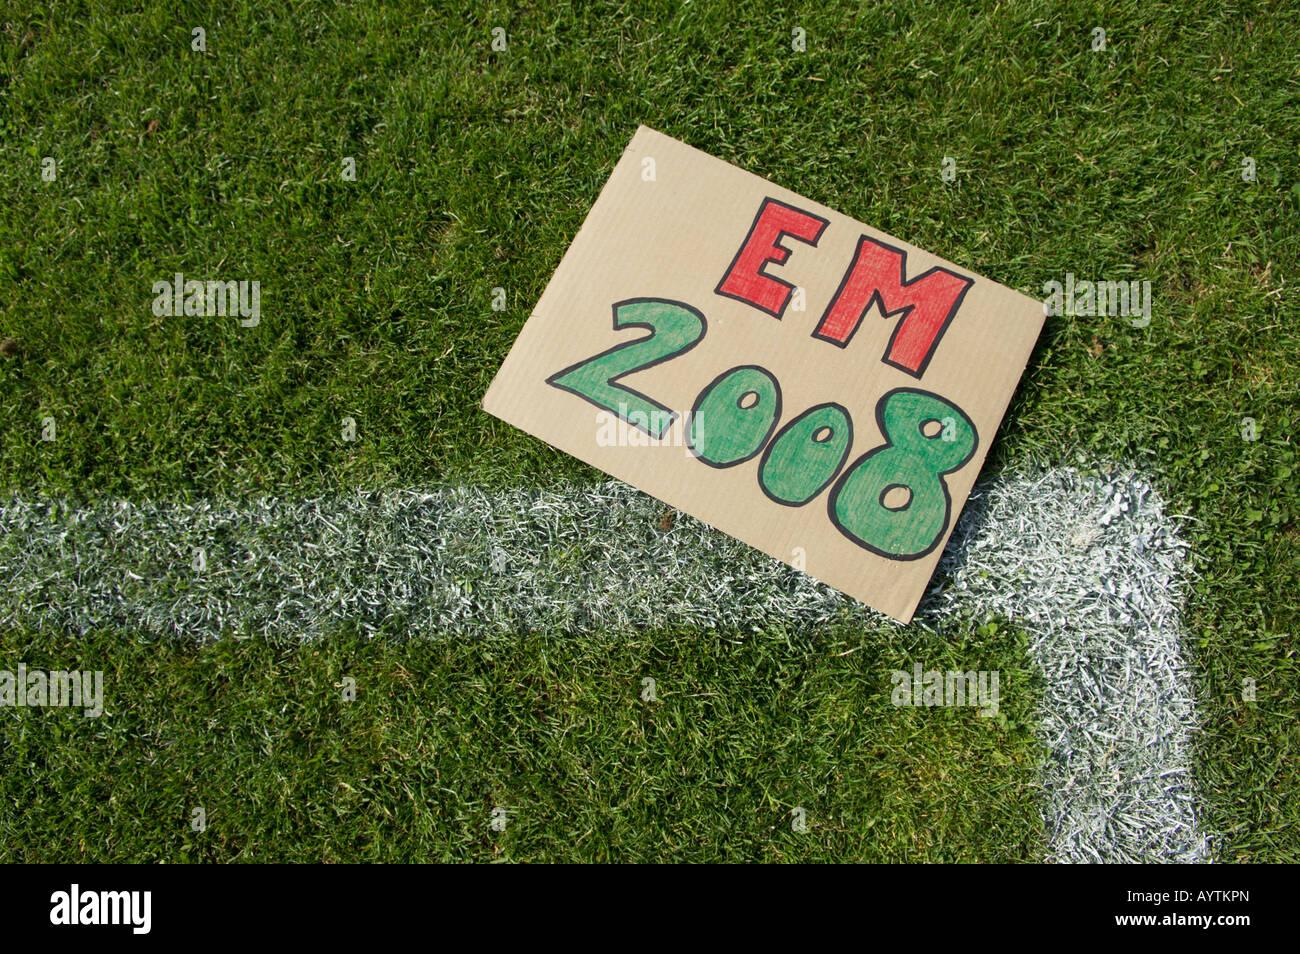 EM 2008 sign lying on soccer field - Stock Image